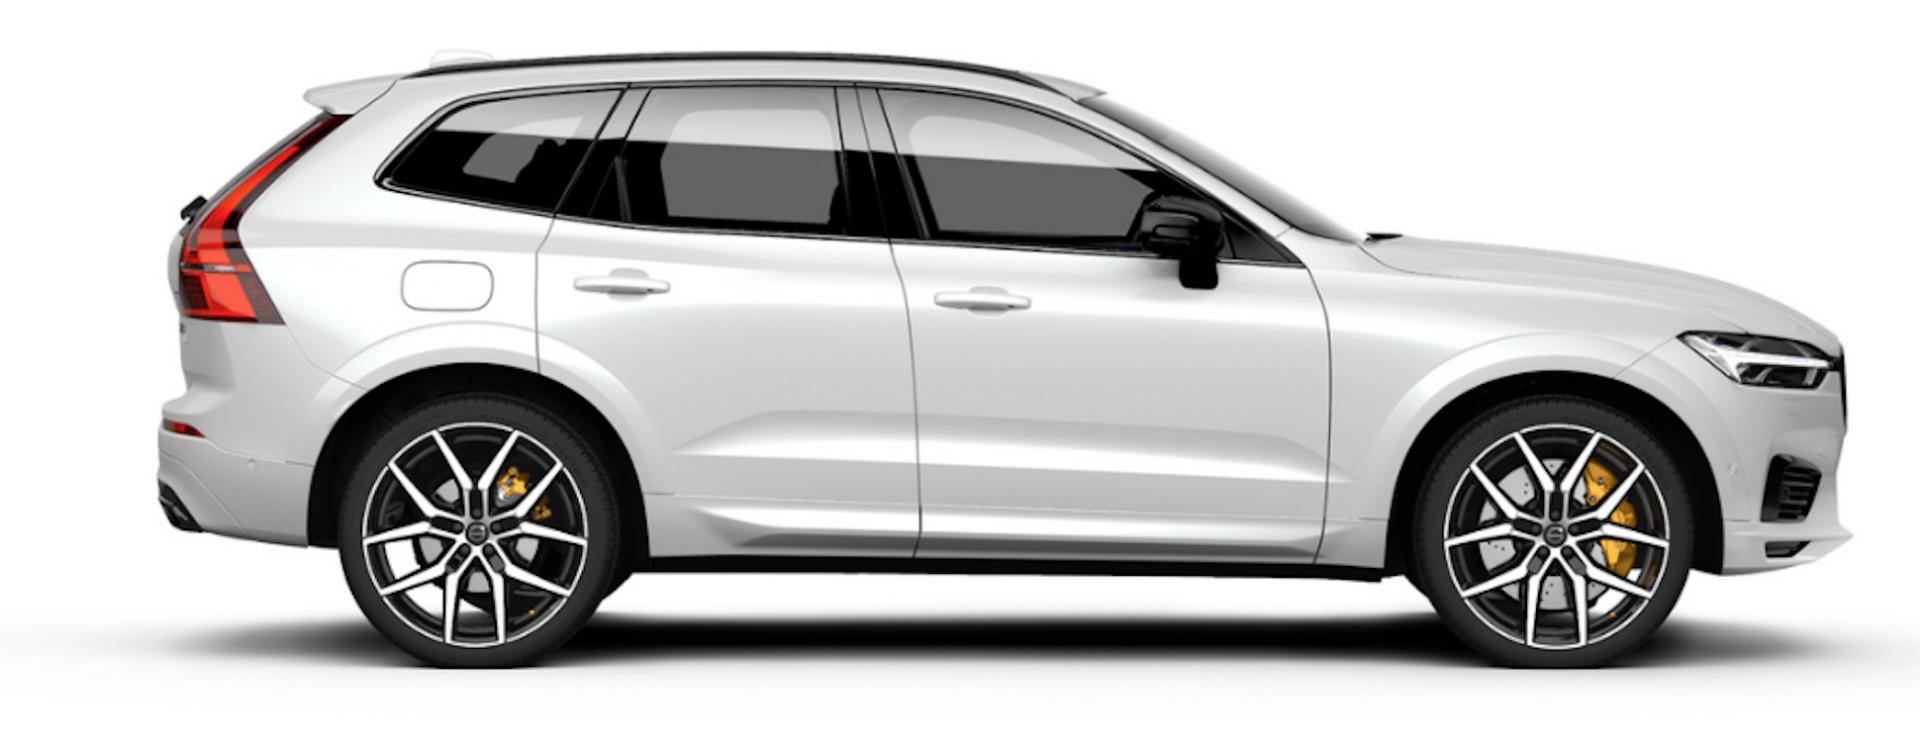 Комплект аксессуаров Basic для Volvo XC60 фото